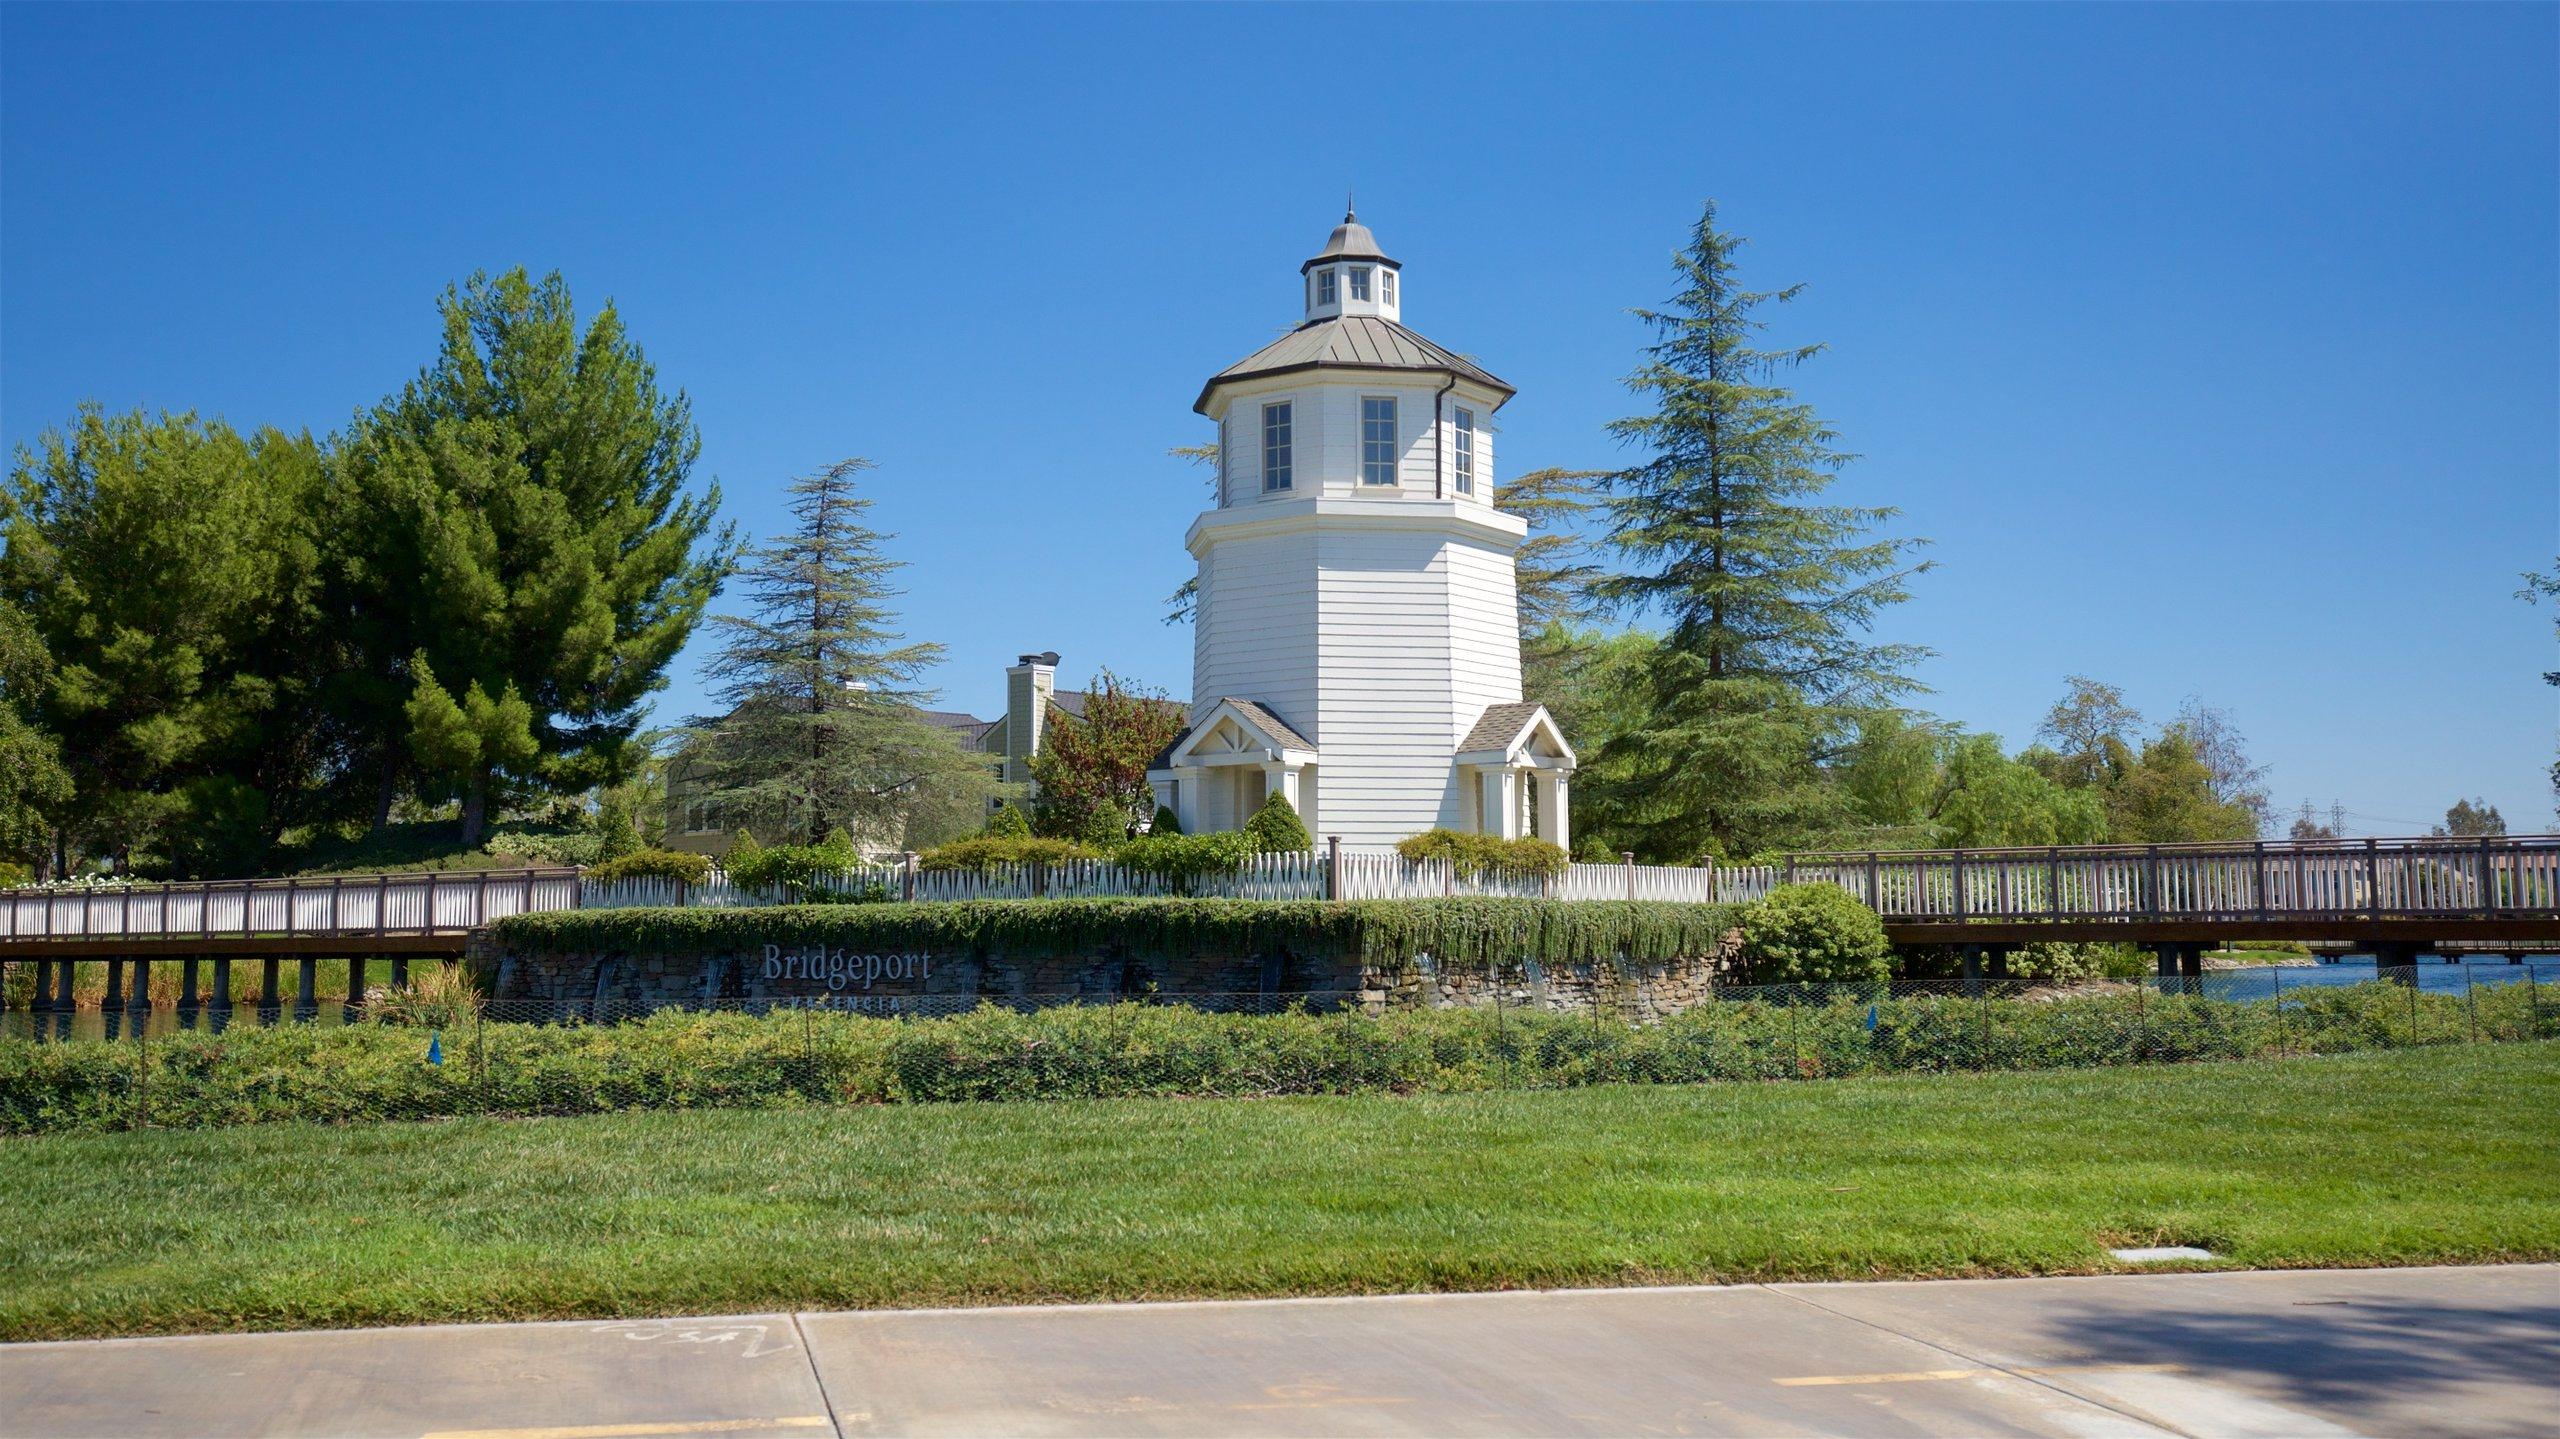 San Gabriel Valley, California, United States of America